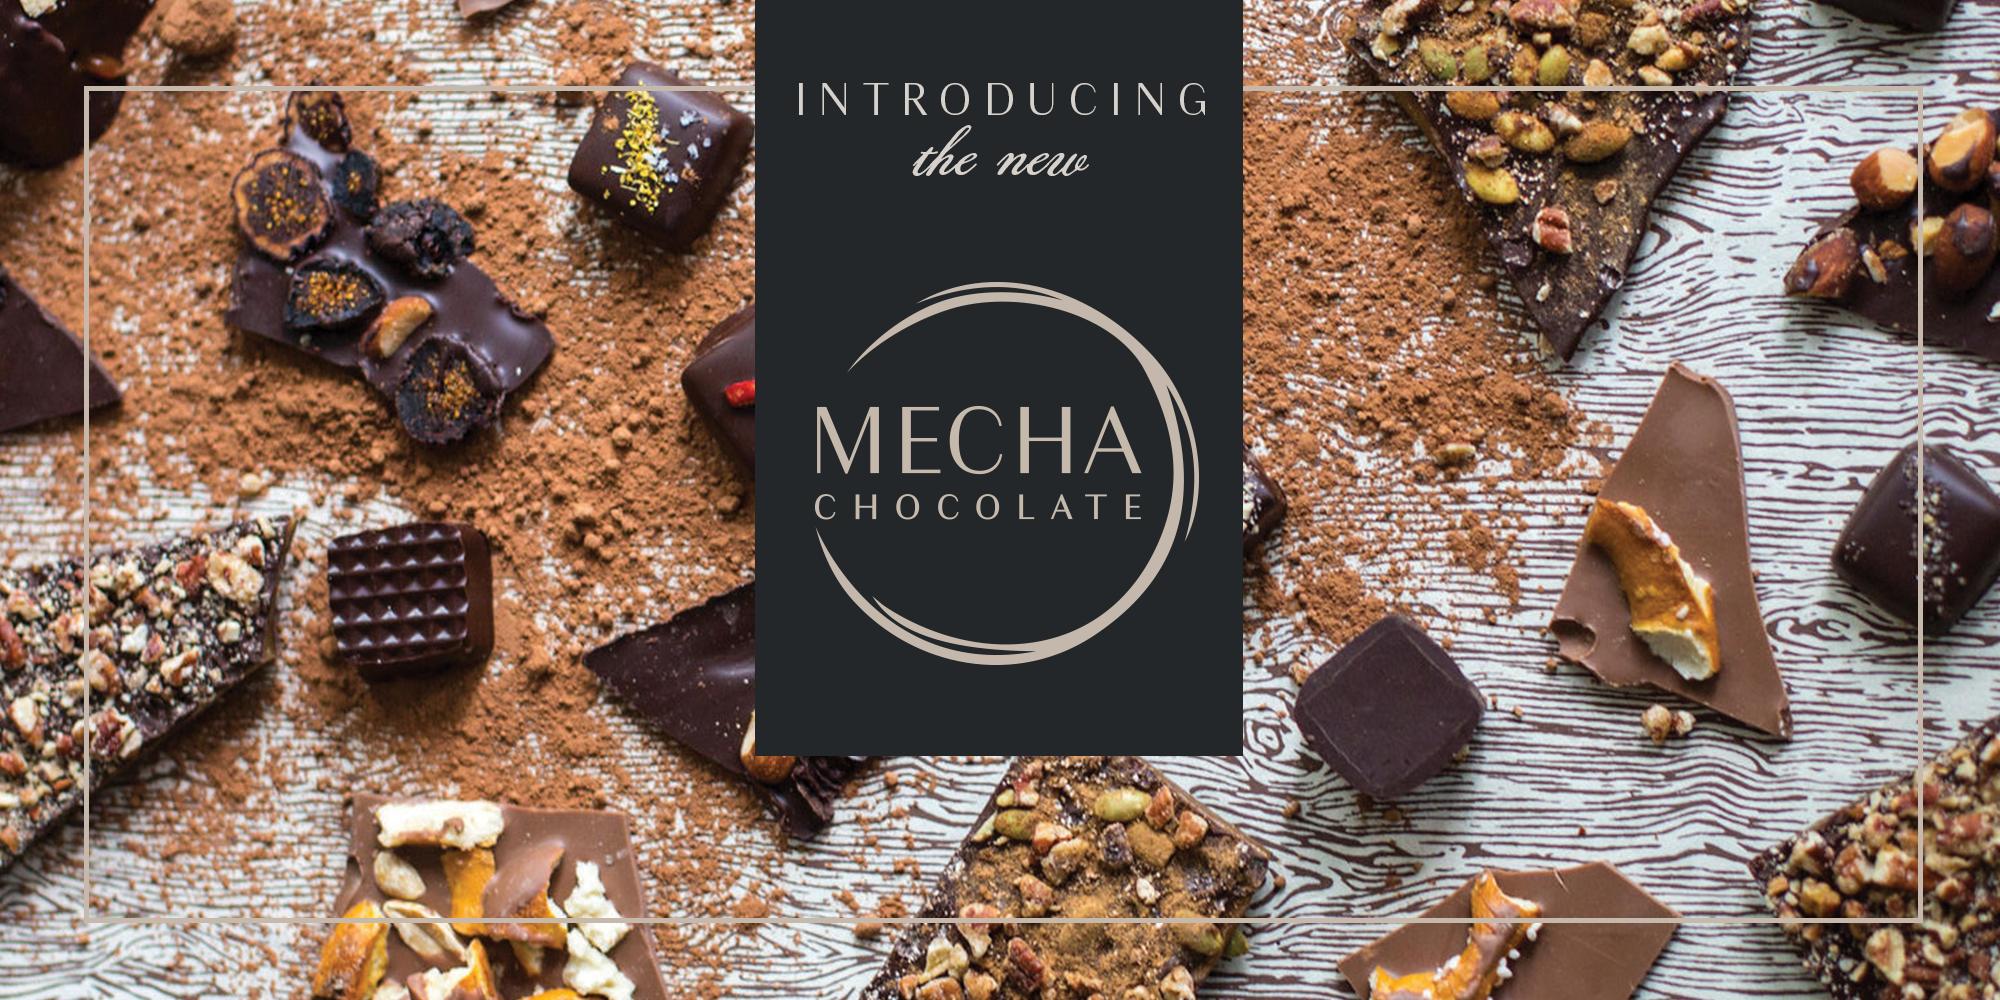 mecha_new-brand.png